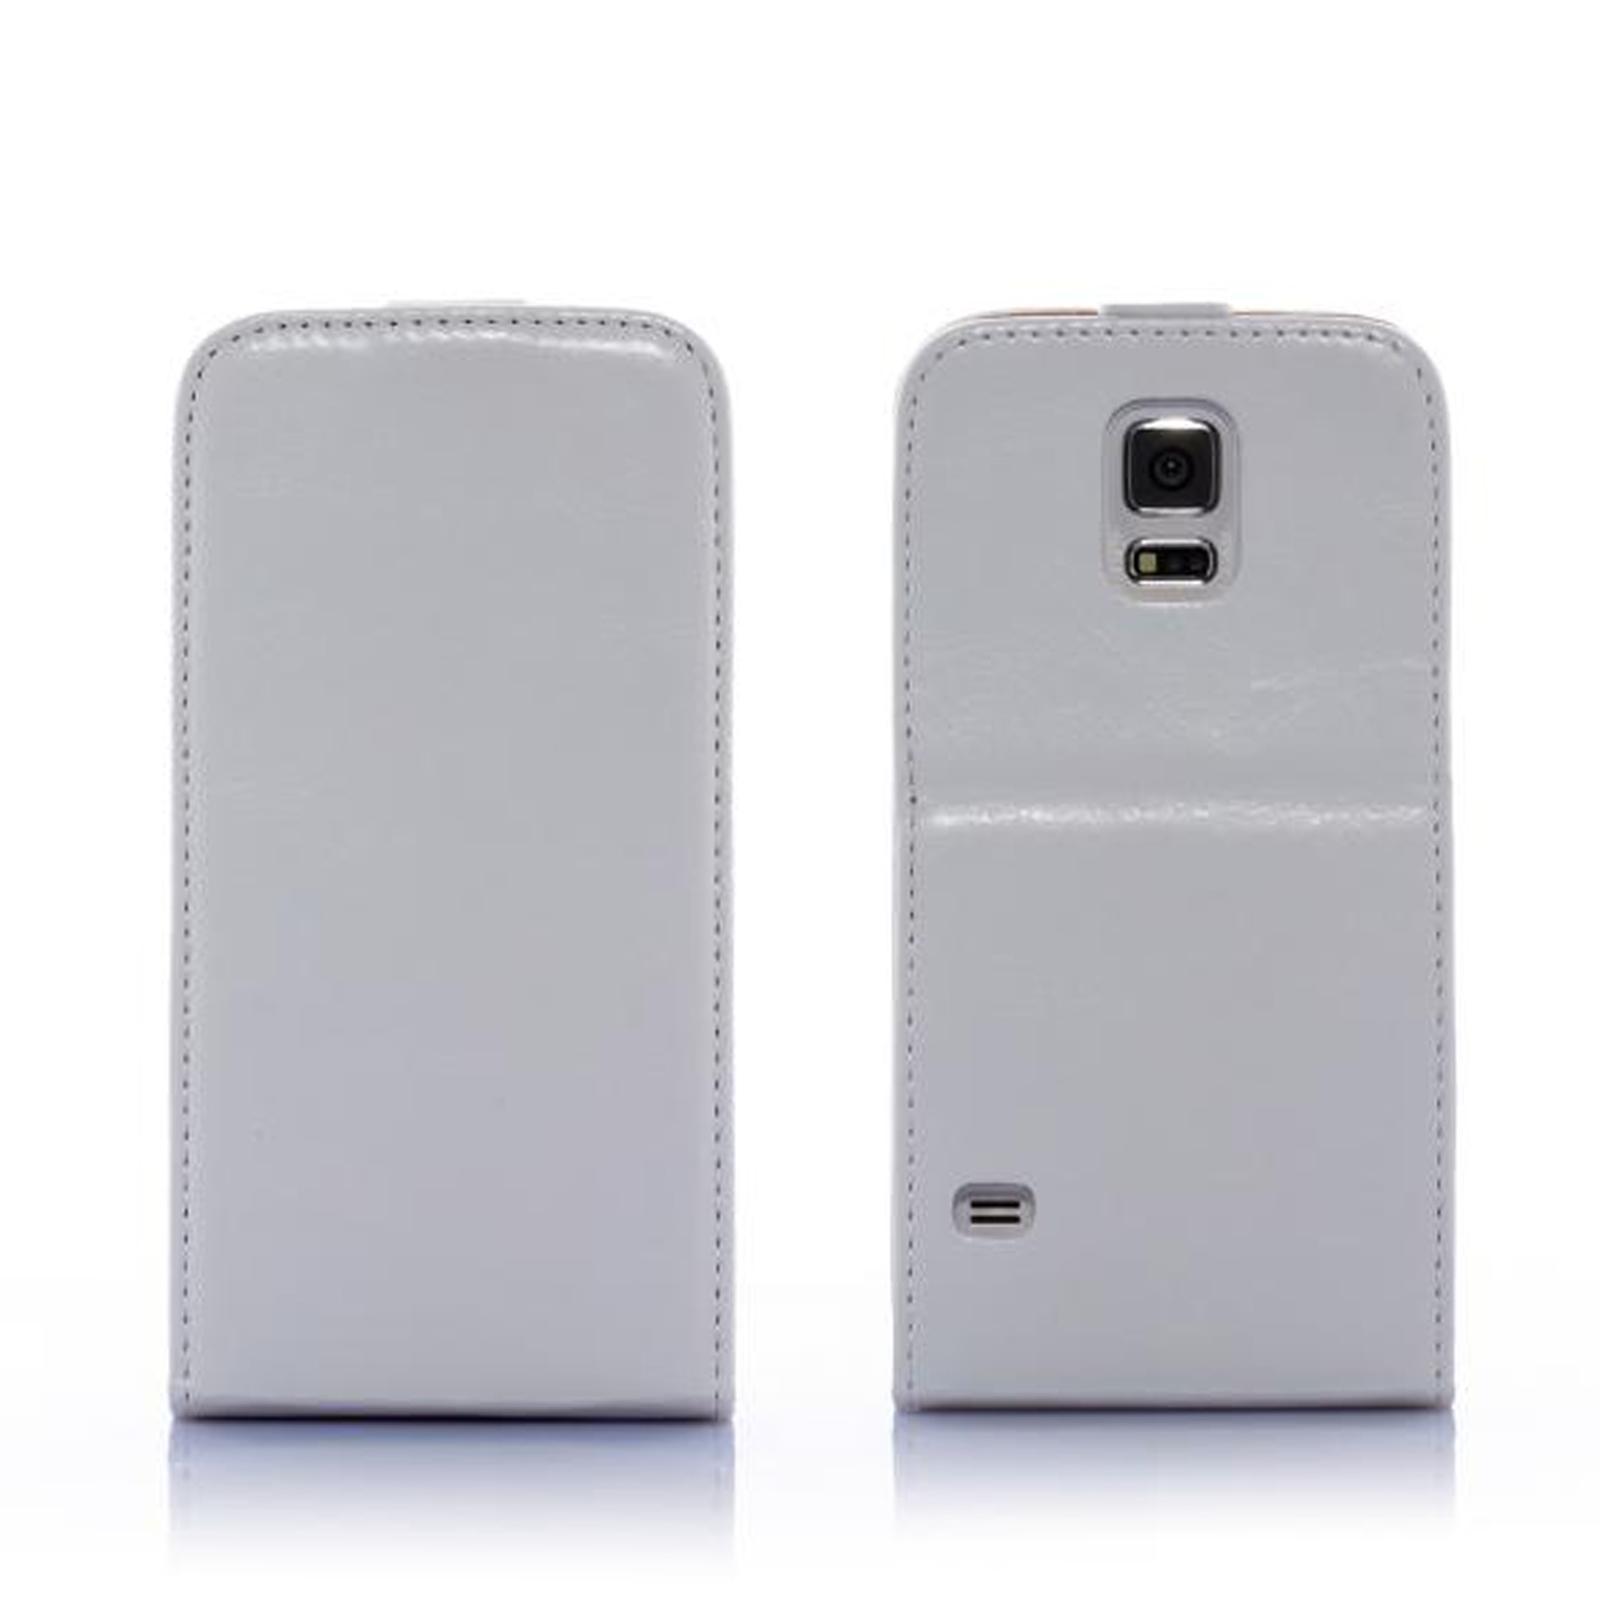 Design-Rabattable-etui-coque-pour-telephone-portable-solide-a-abattant